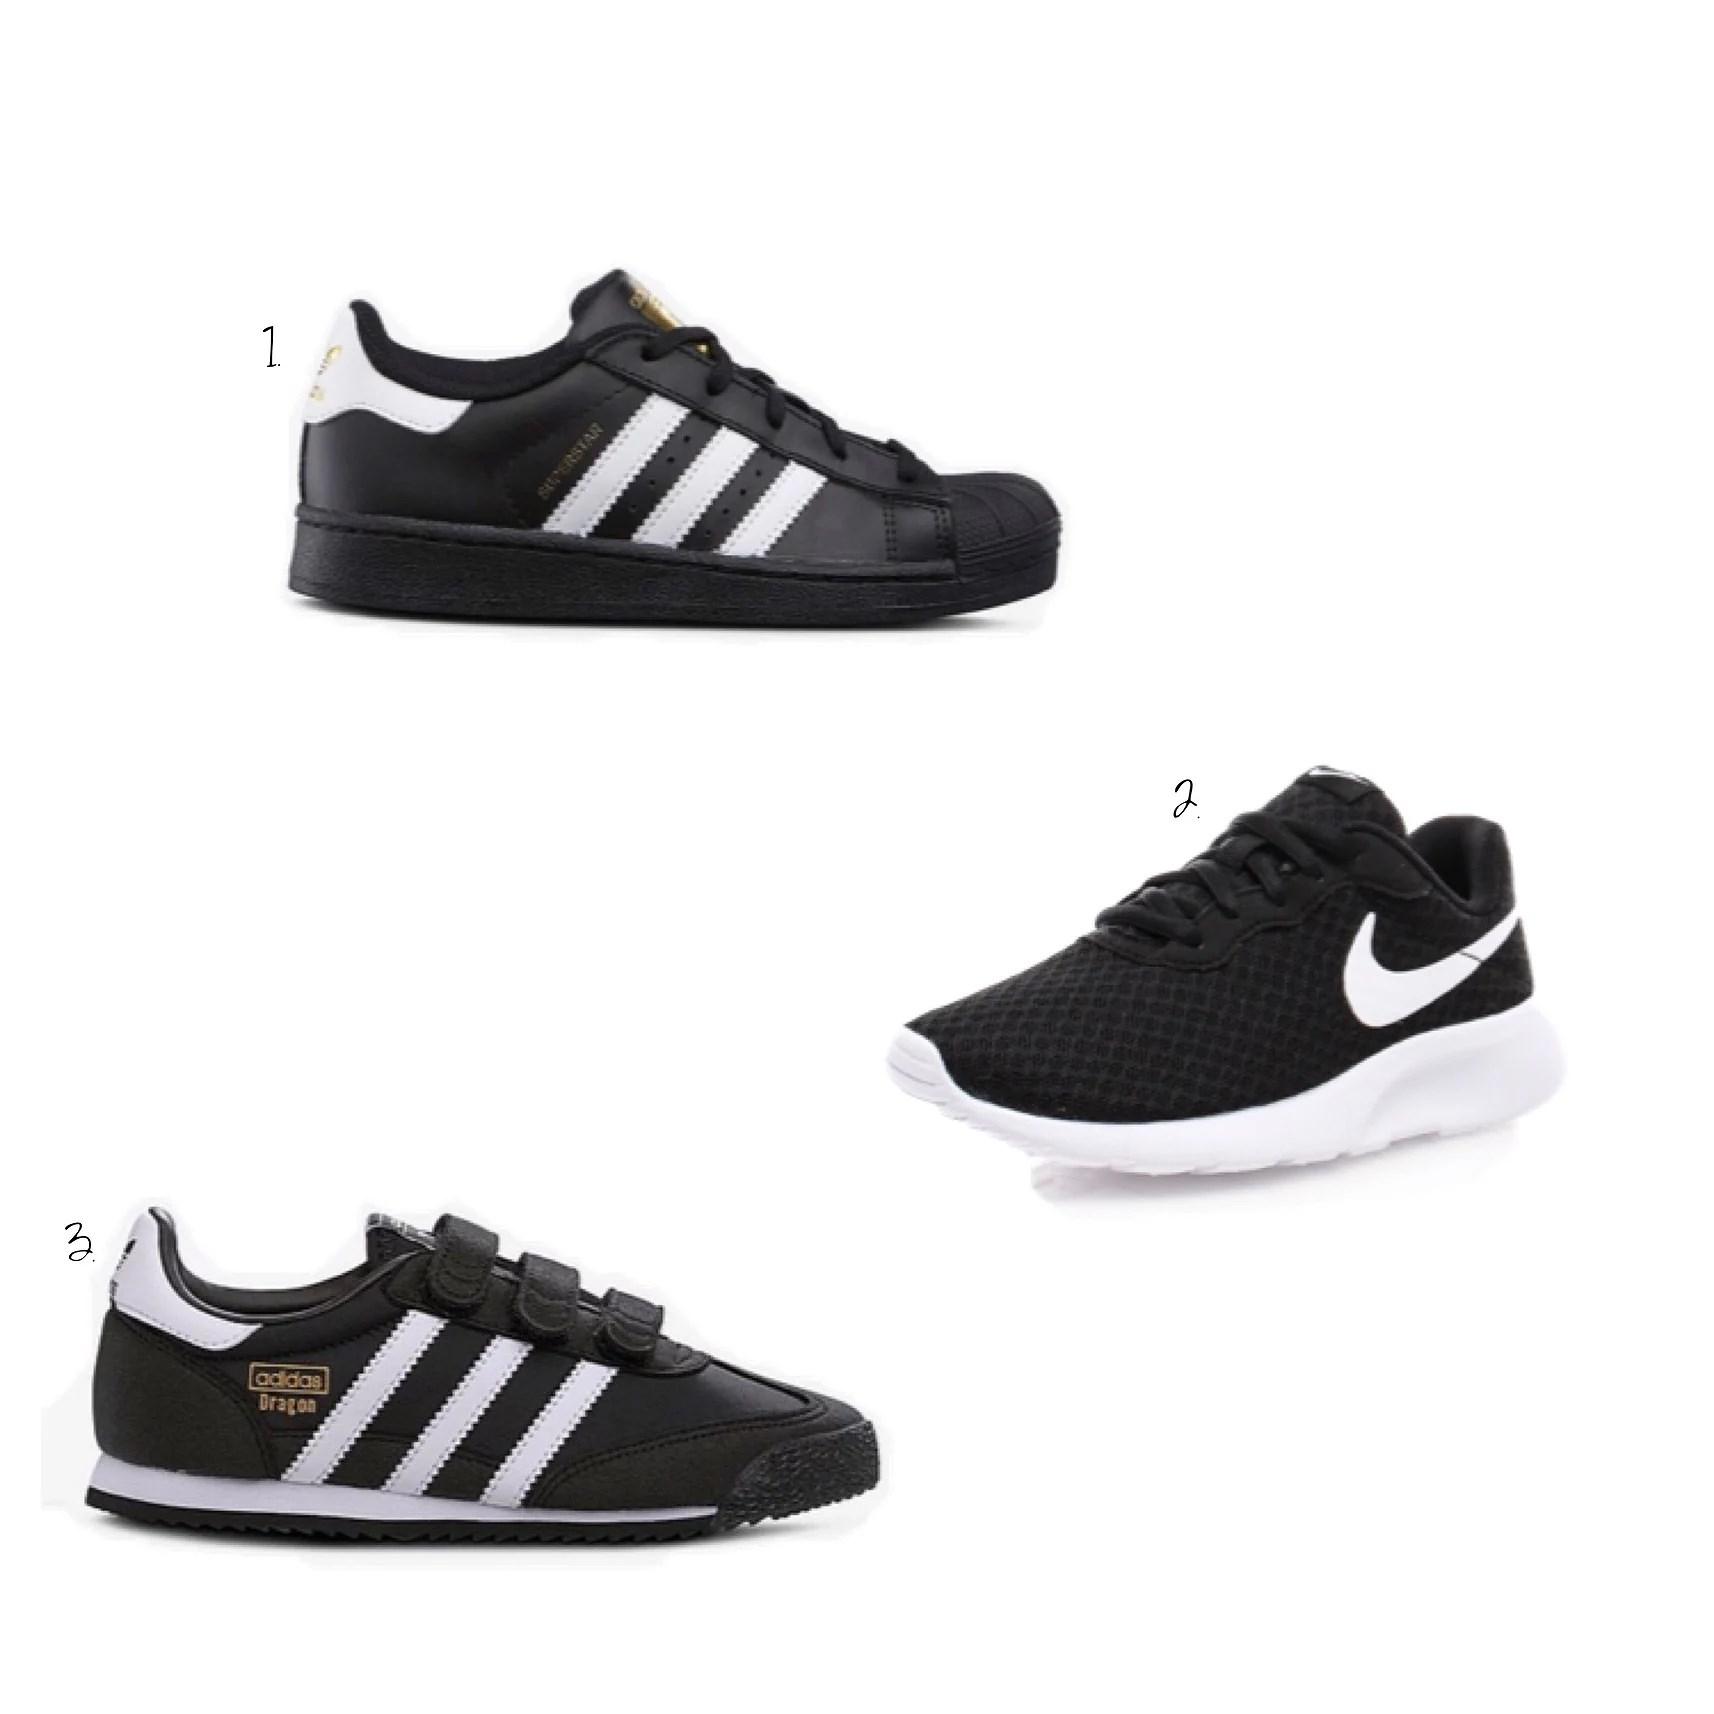 75fa2eb133c Adidas mindre storlekar : Adidas större storlekar // 2. Adidas mindre  storlekar : Adidas större storlekar // 3.